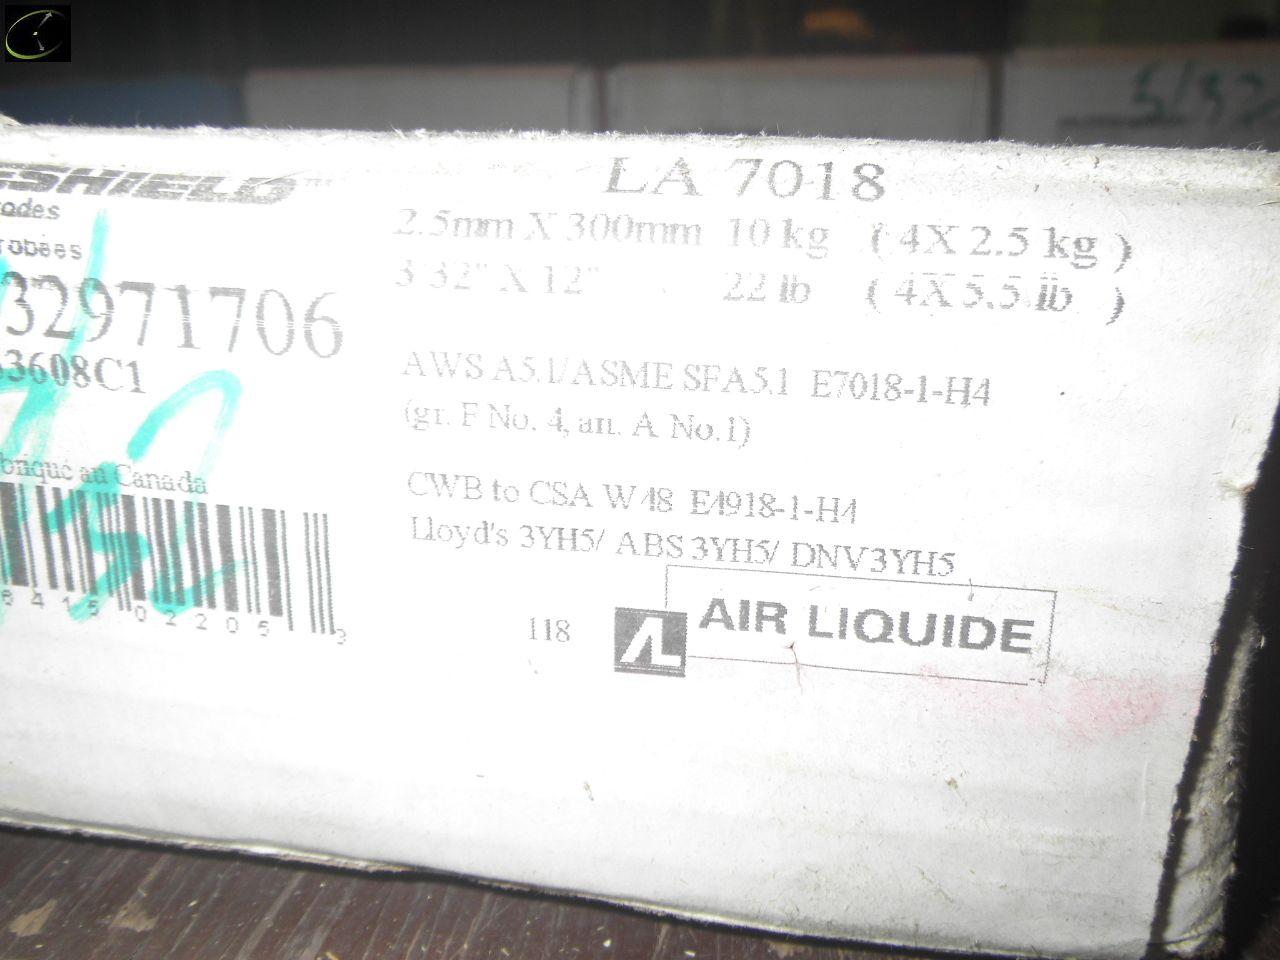 Lot 41 - THREE Cases Of BLUESHIELD 3/32x12'' 7018 Welding Rod.